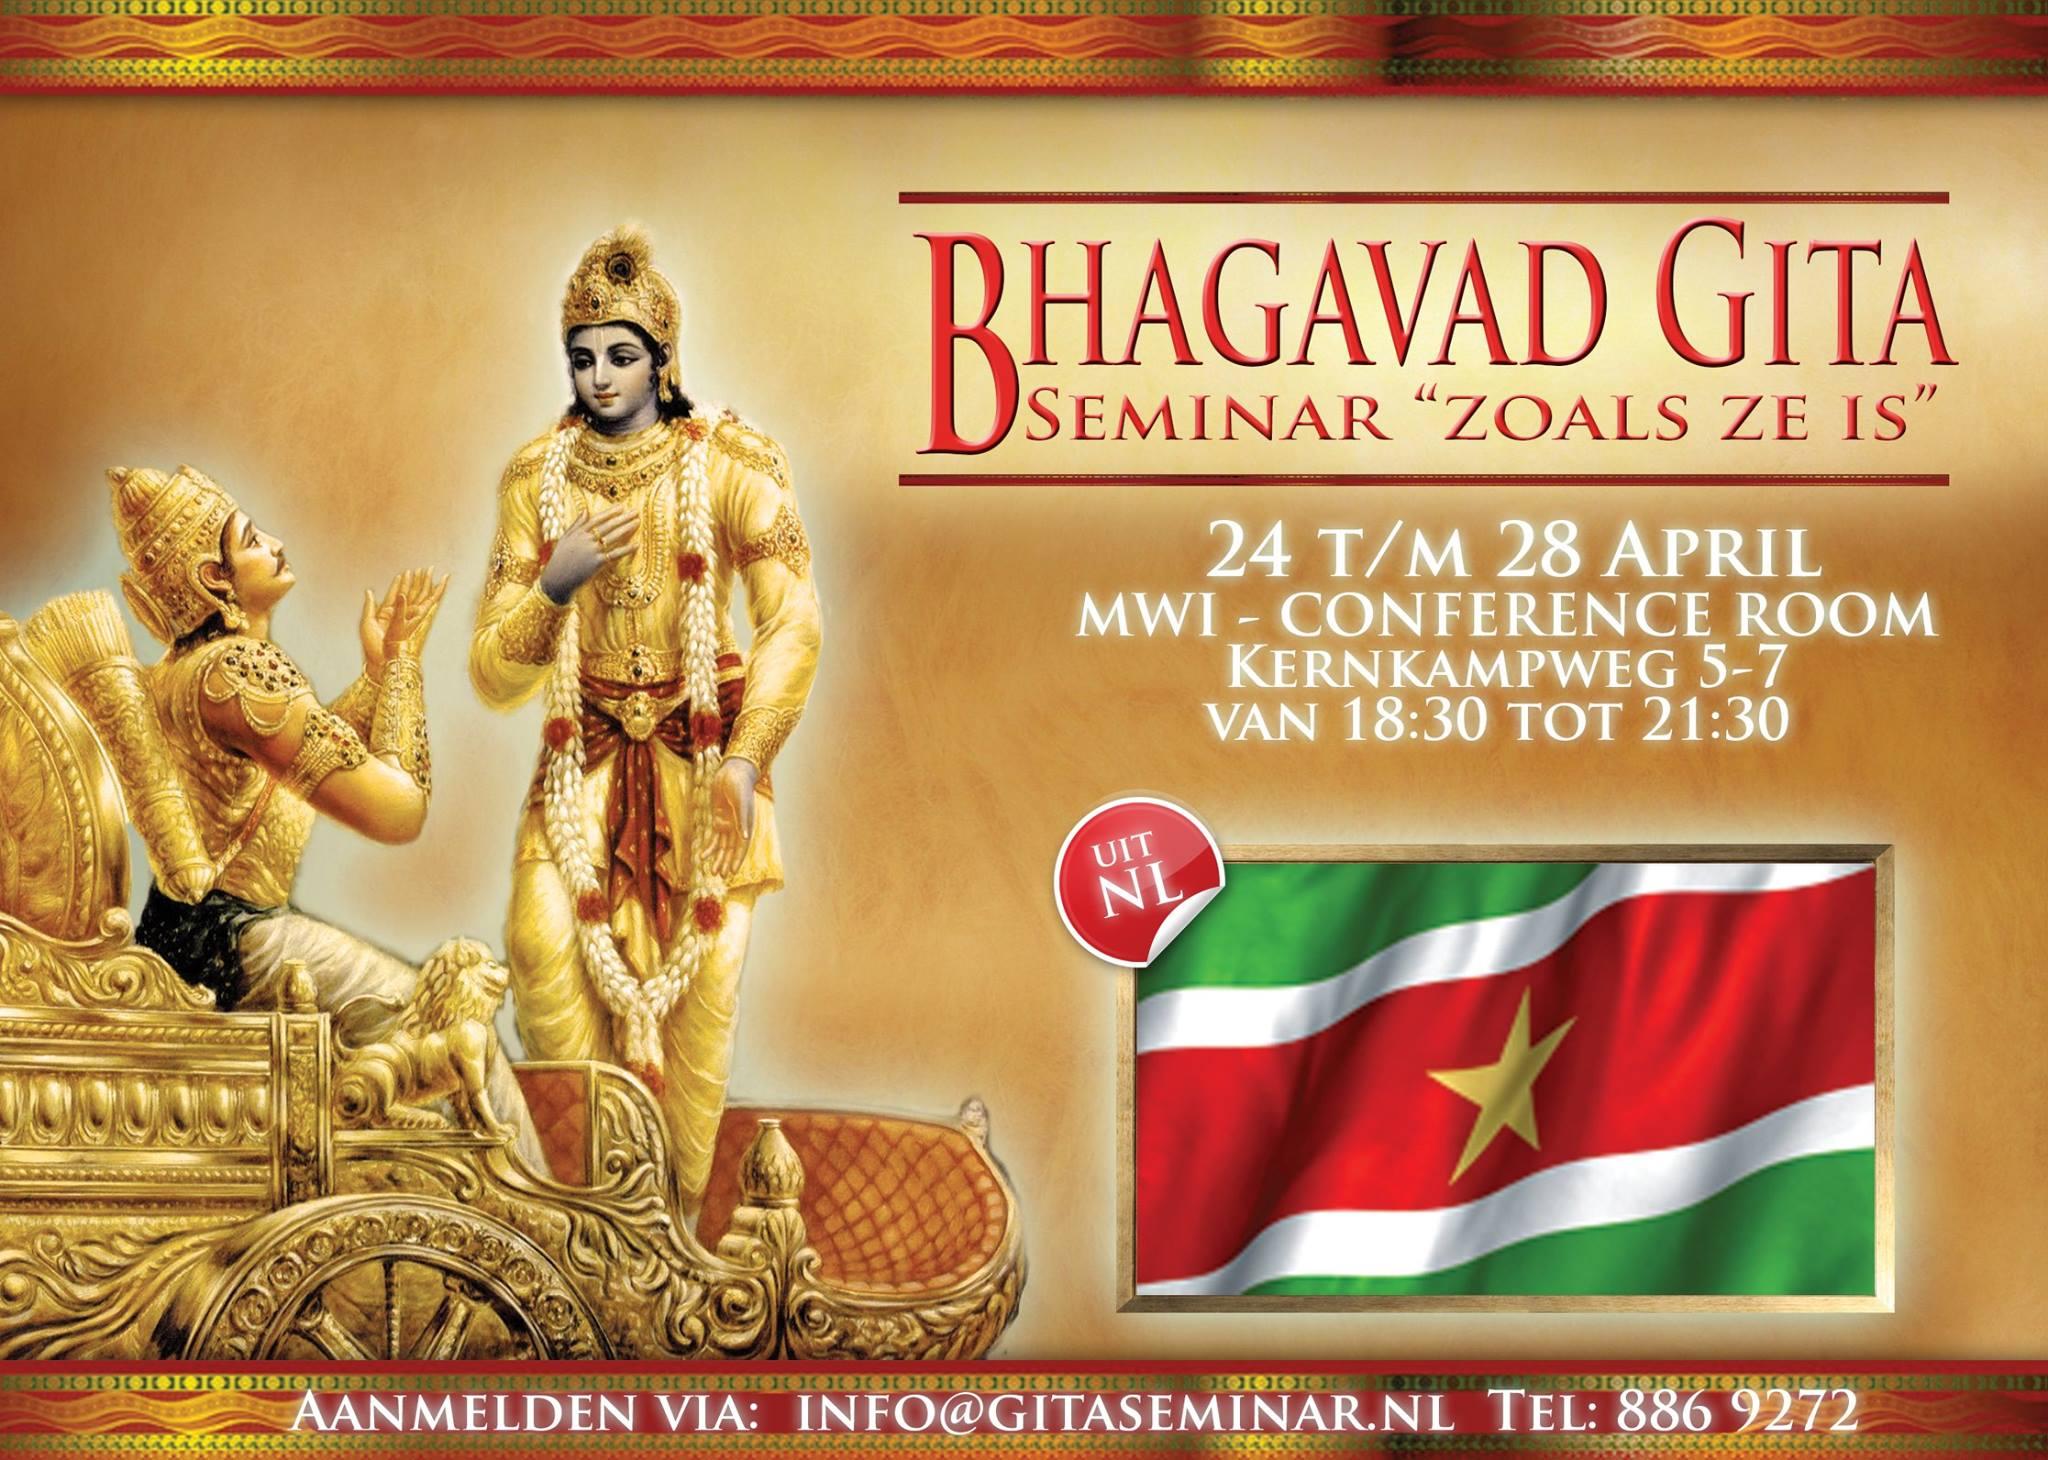 Citaten Uit Bhagavad Gita : Bhagavad gita seminar paramaribo t m april